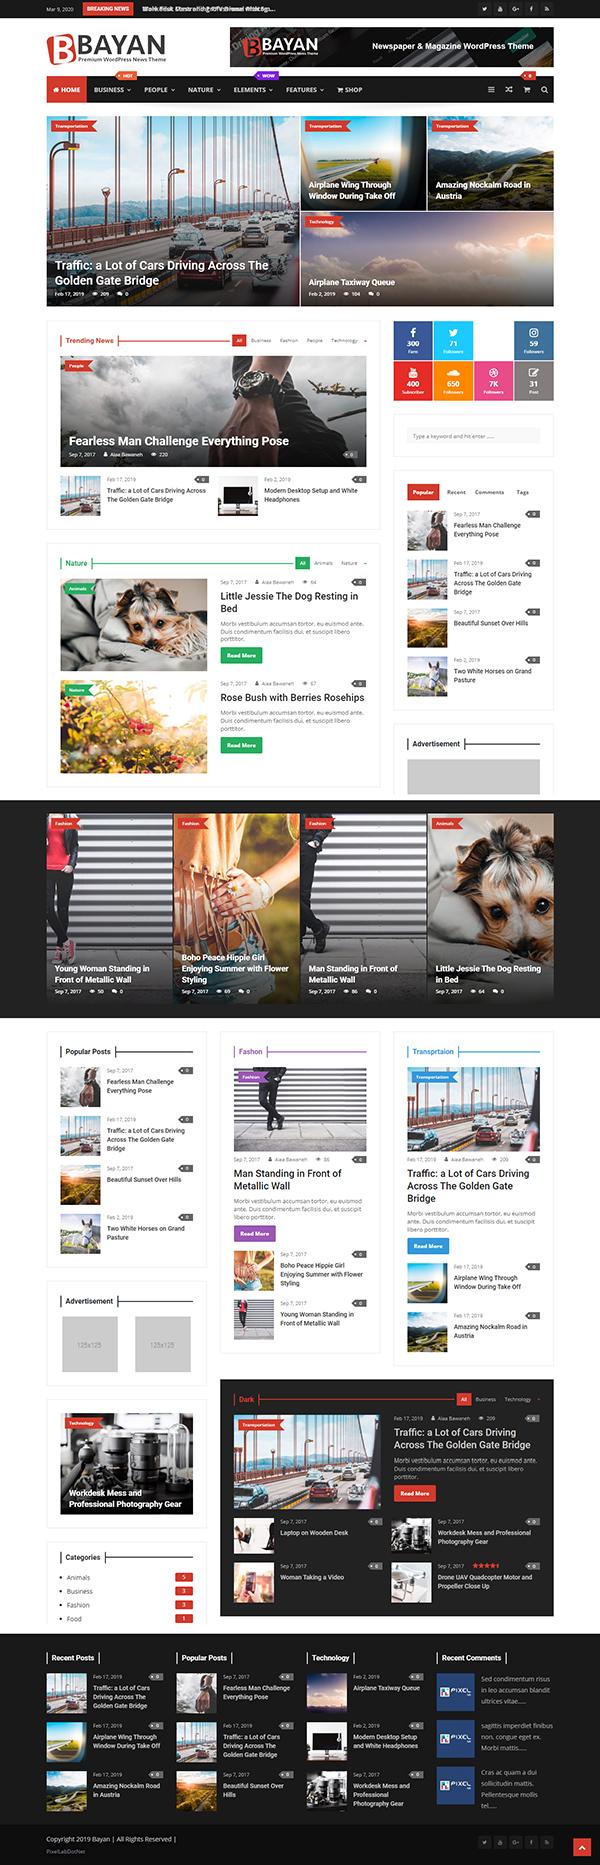 Bayan - Newspaper & Magazine WordPress Theme